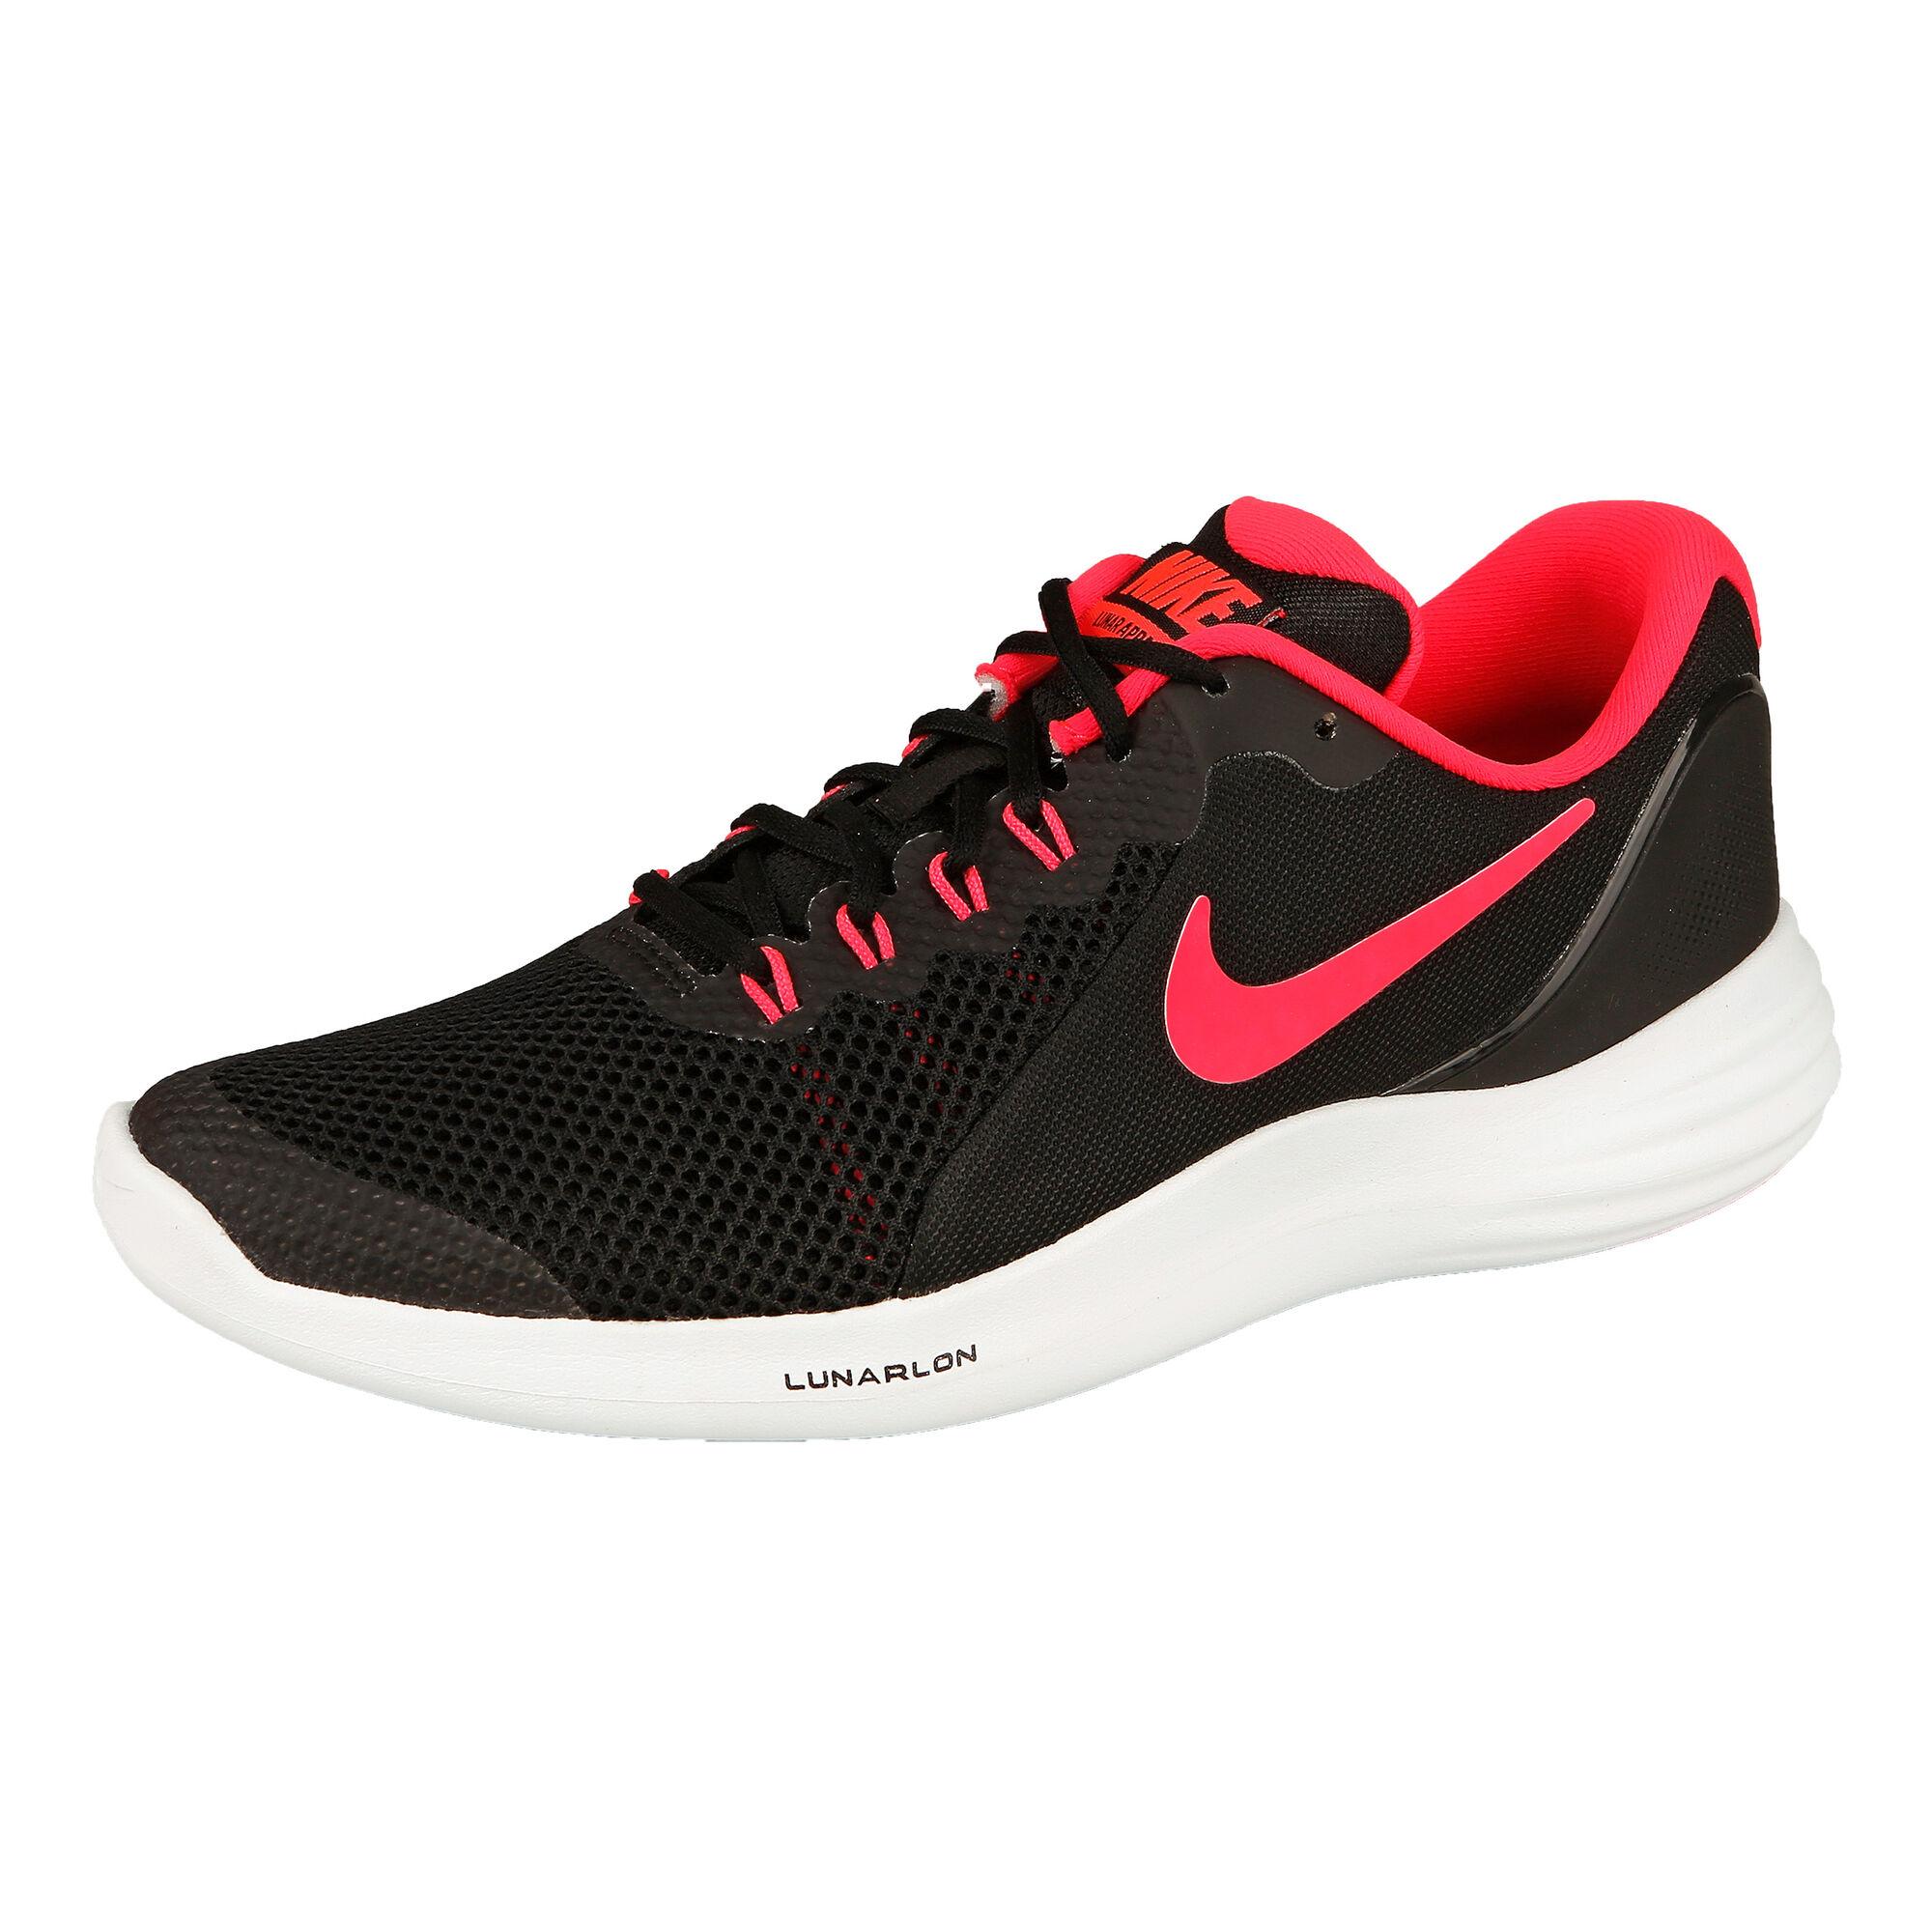 promo code dee6d dc337 Nike Lunar Apparent Neutral Running Shoe Kids - Black, Pink